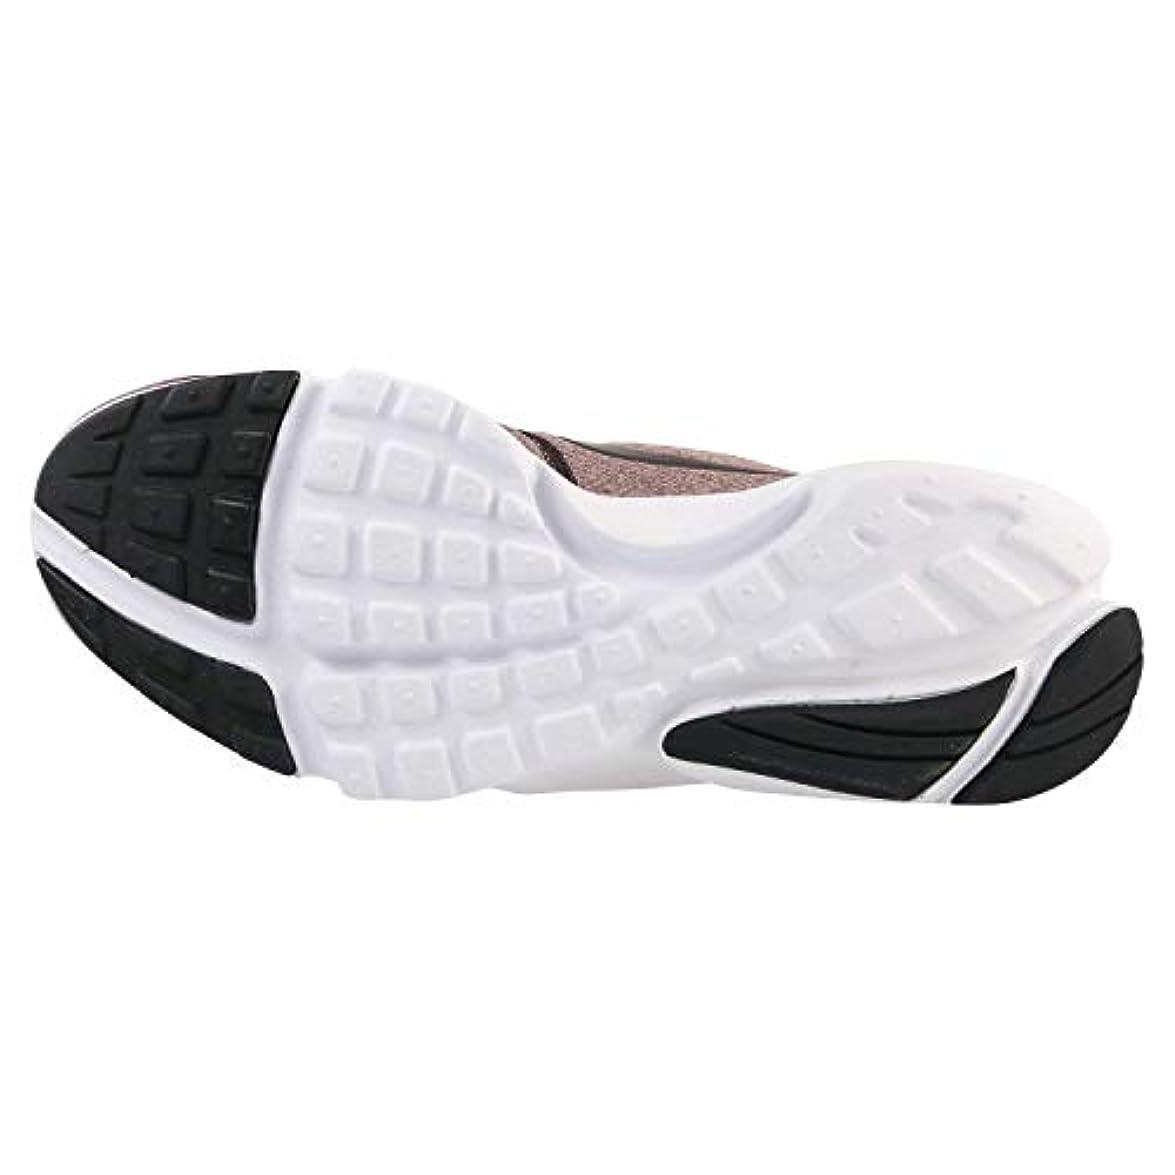 Nike Donne Presto Fly Se Running 910570 Sneakers Turnschuhe